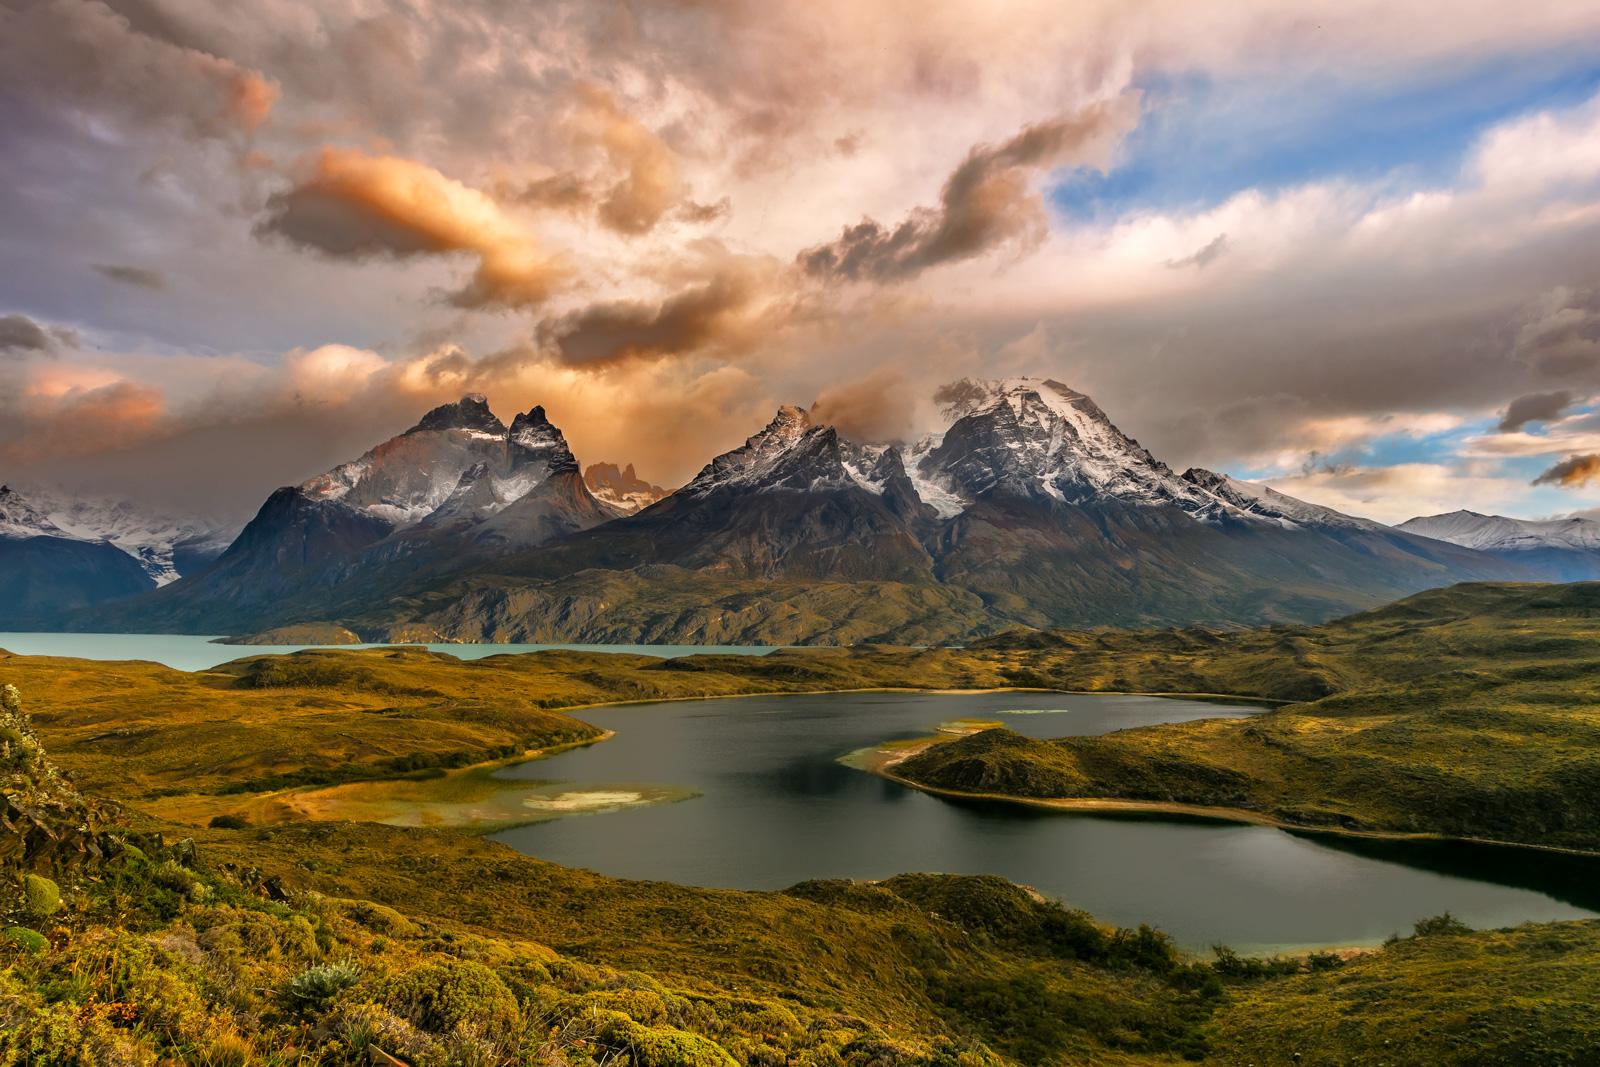 Chile, Patagonia, Torres del Paine, Lake, Sunrise, limited edition, photograph, fine art, landscape, photo